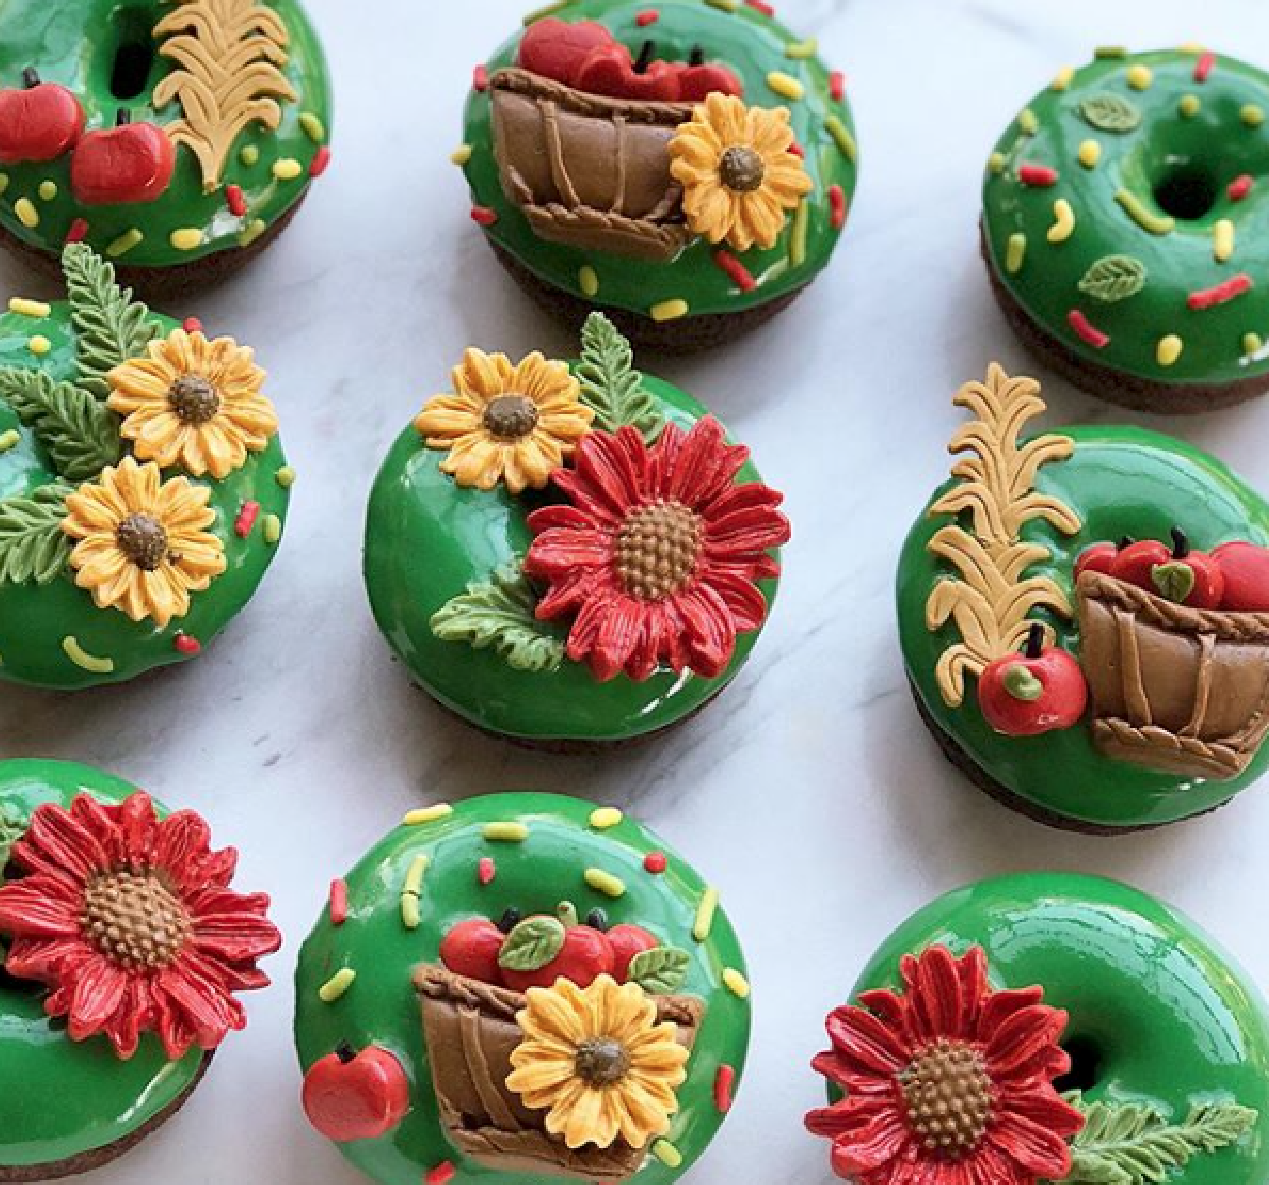 Nana Sprinkles Bake Shop Fall 1